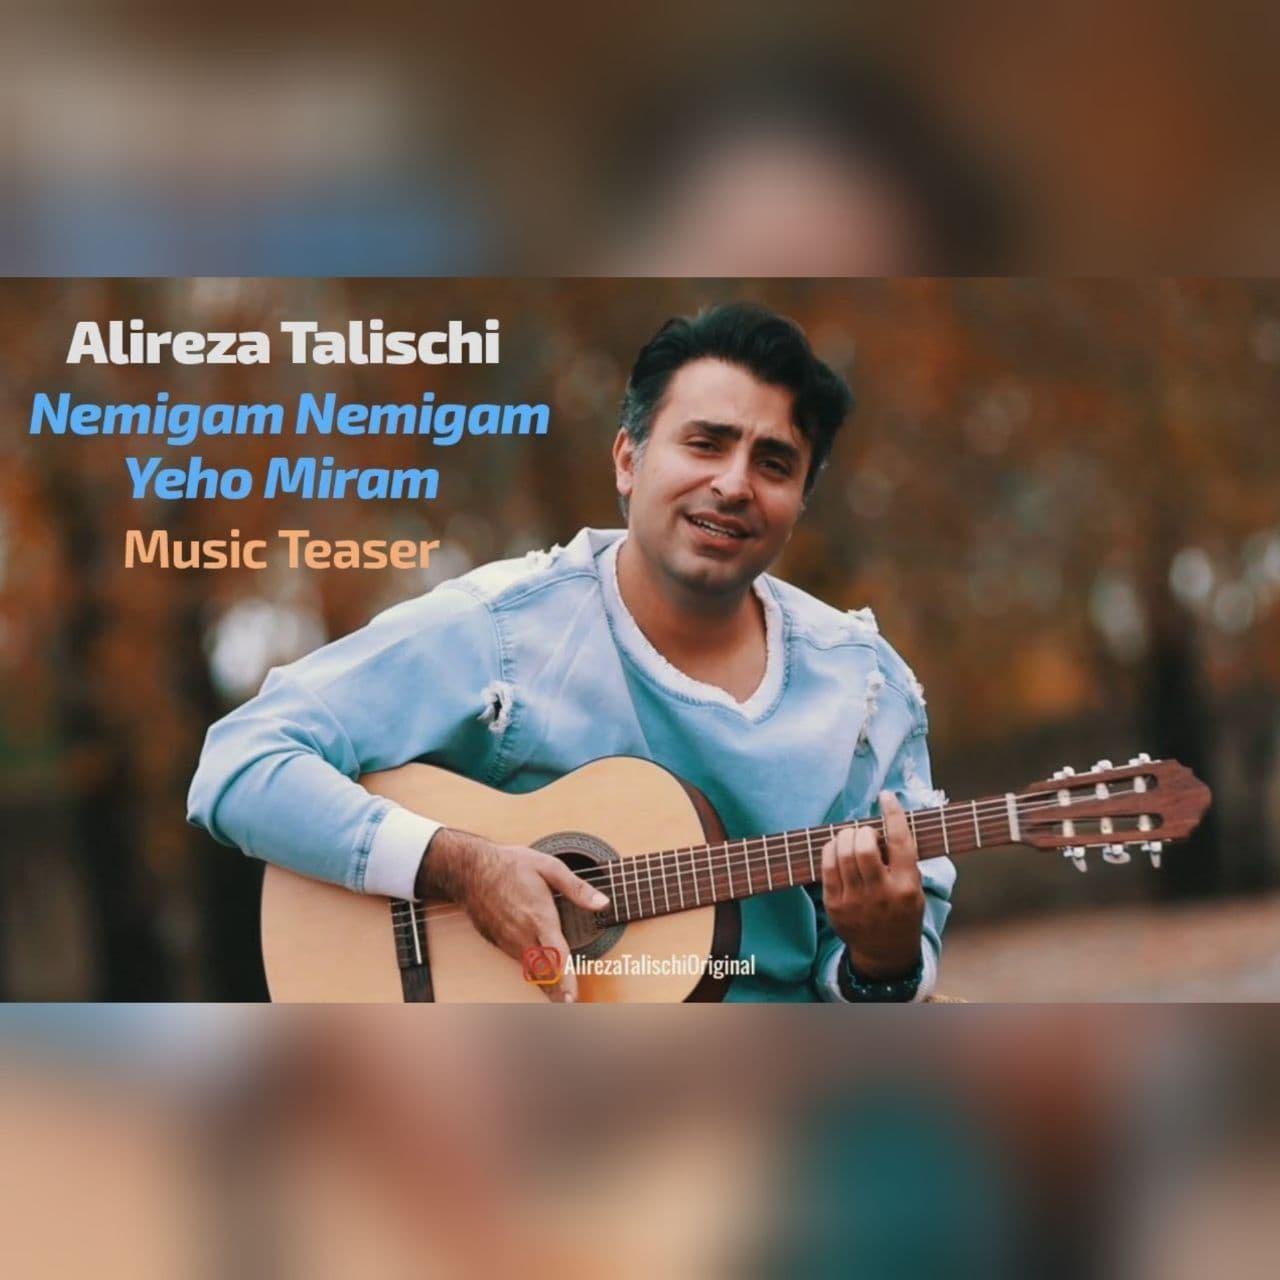 Alireza Talischi – Nemigam Nemigam Yeho Miram